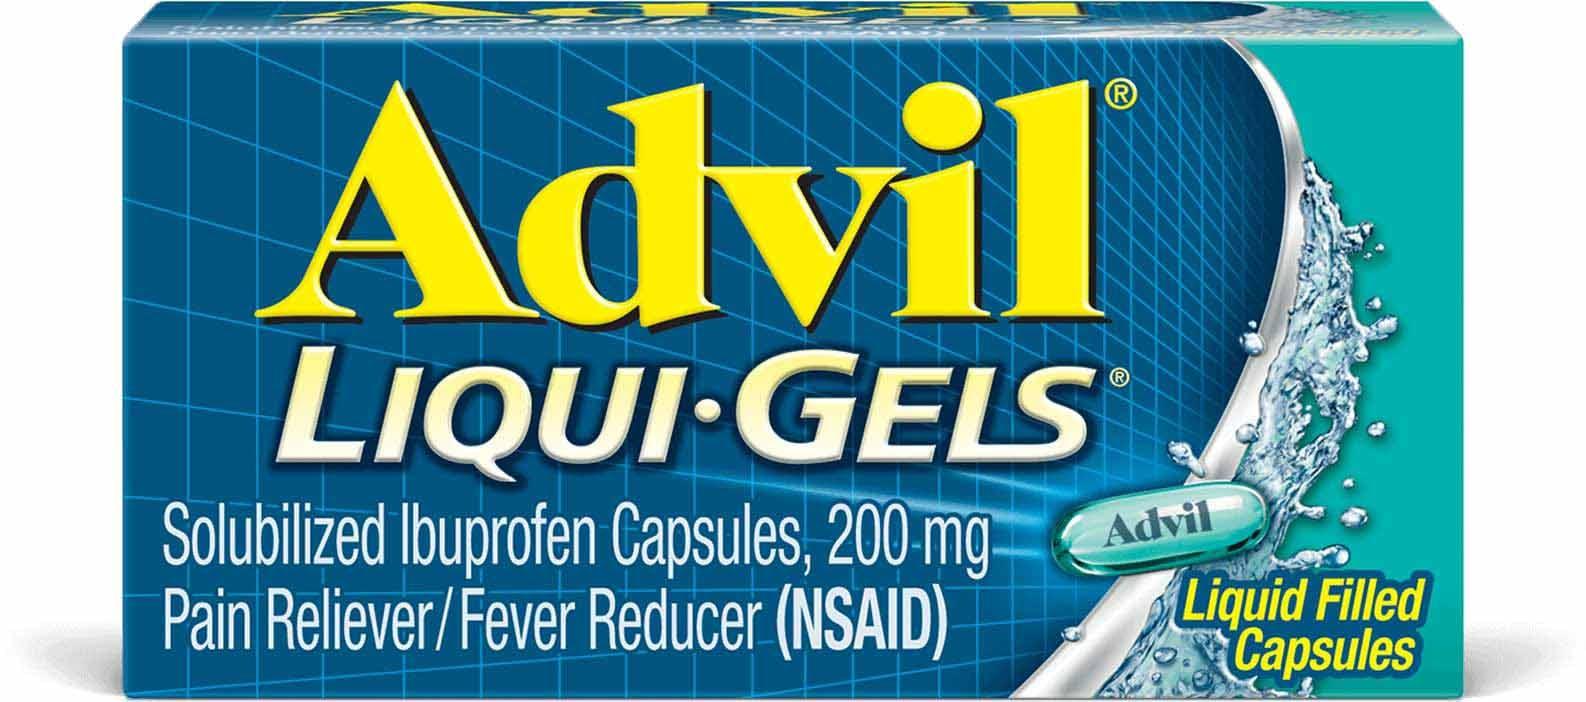 Advil Liqui Gel